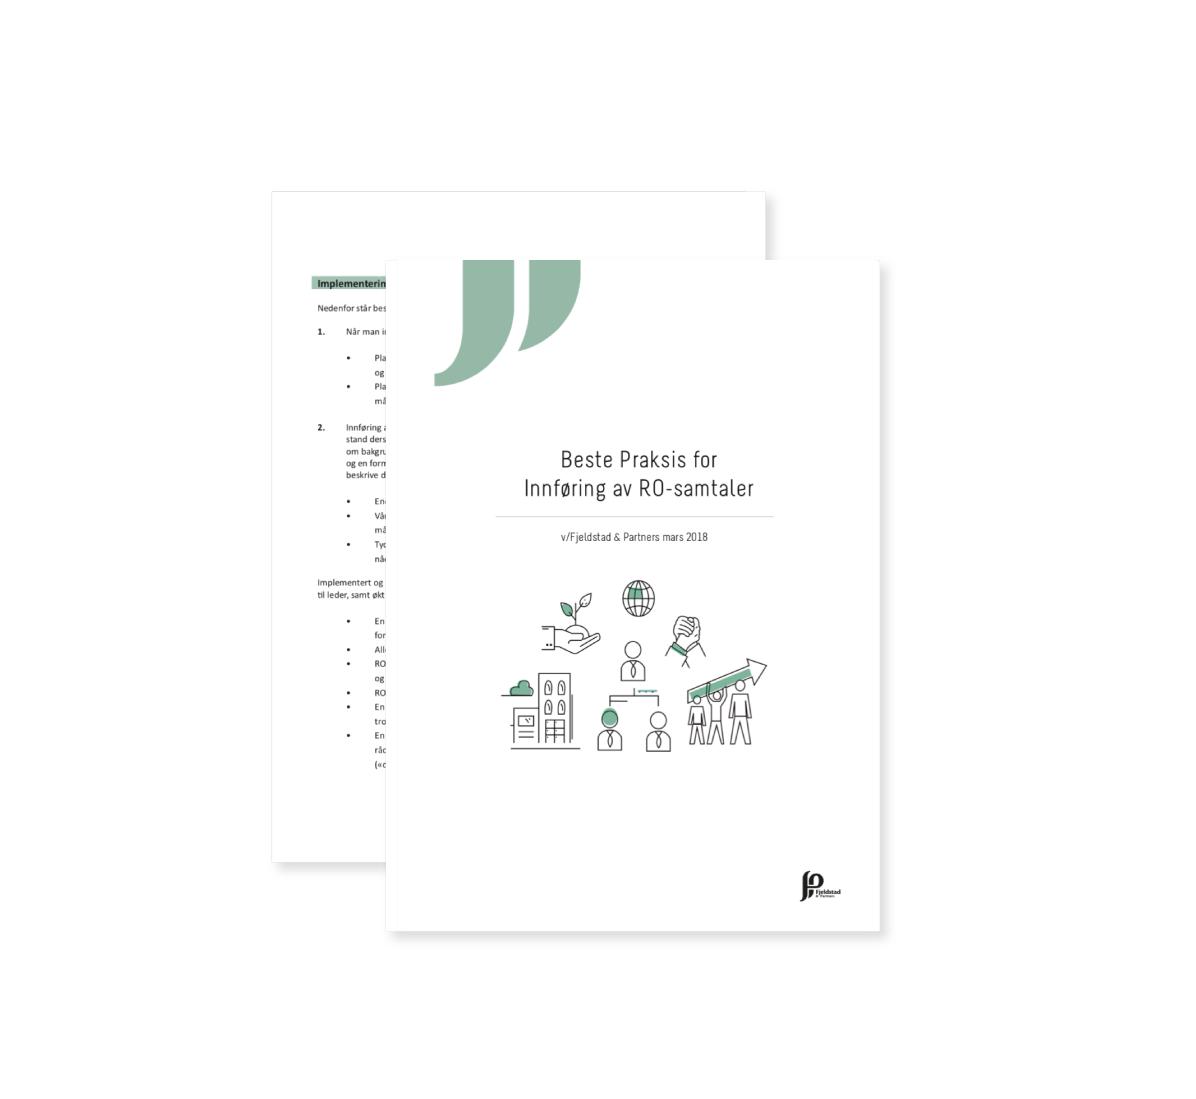 Whitepaper---RO-samtaler---mockup.png